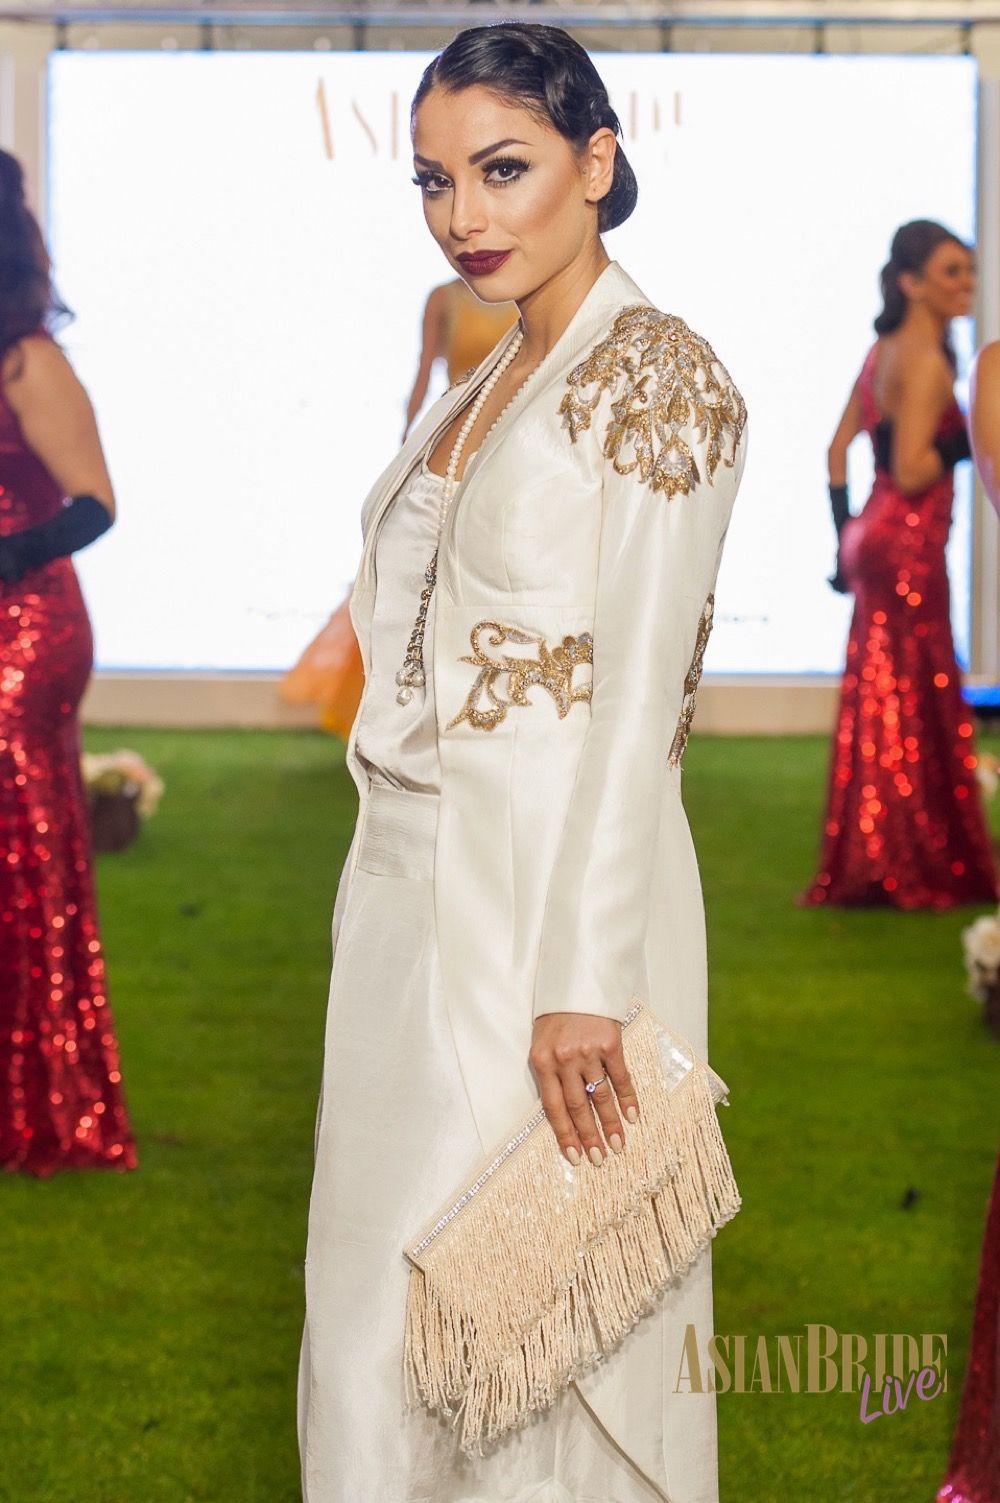 White Aboutir-collection -INDIAN-PAKISTANI-WEDDING-DRESS-CATWALK-FASHION_DSC2471